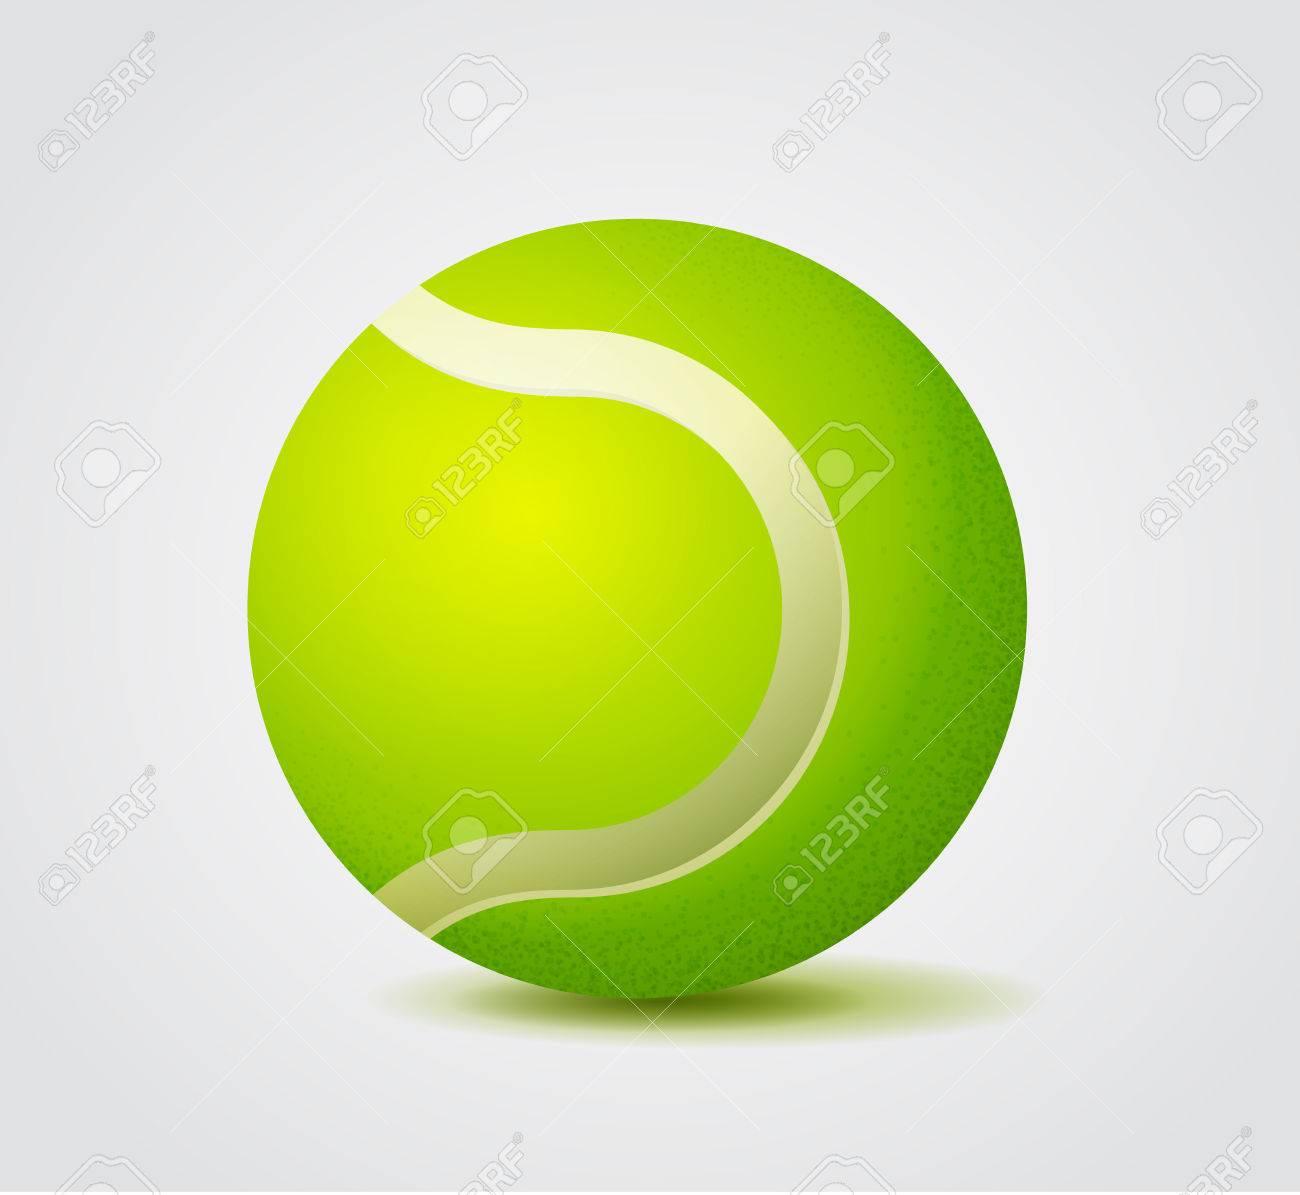 Vivid Green Tennis Ball Color Vector Illustration Royalty Free